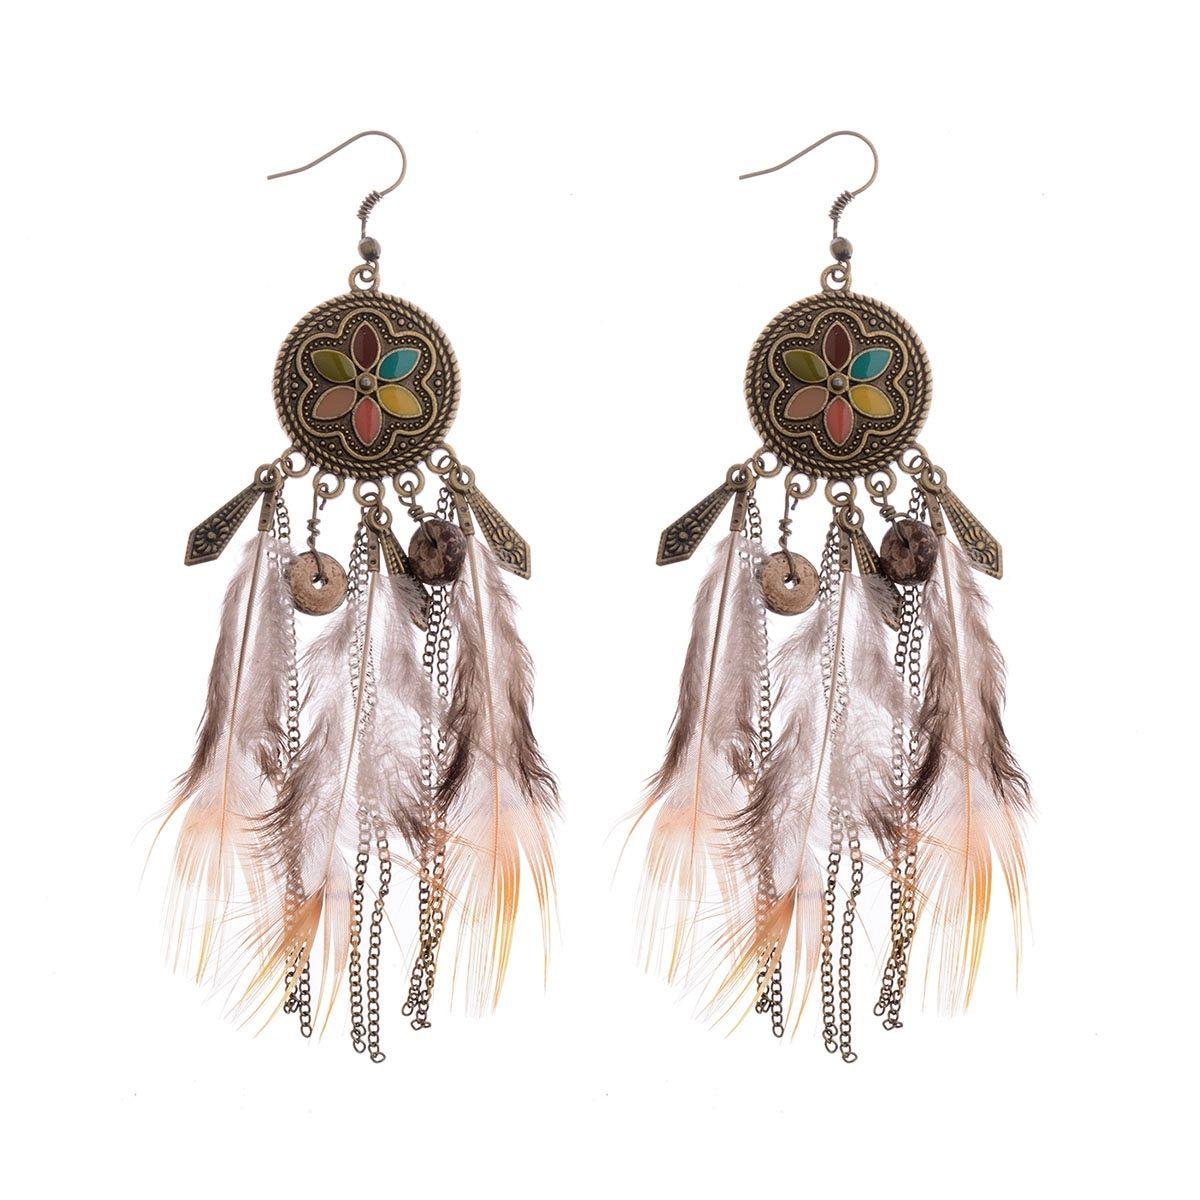 3900631da24c7 1.83AUD - Vintage Fashion Women's Bohemian Feathers&Multi Feather ...